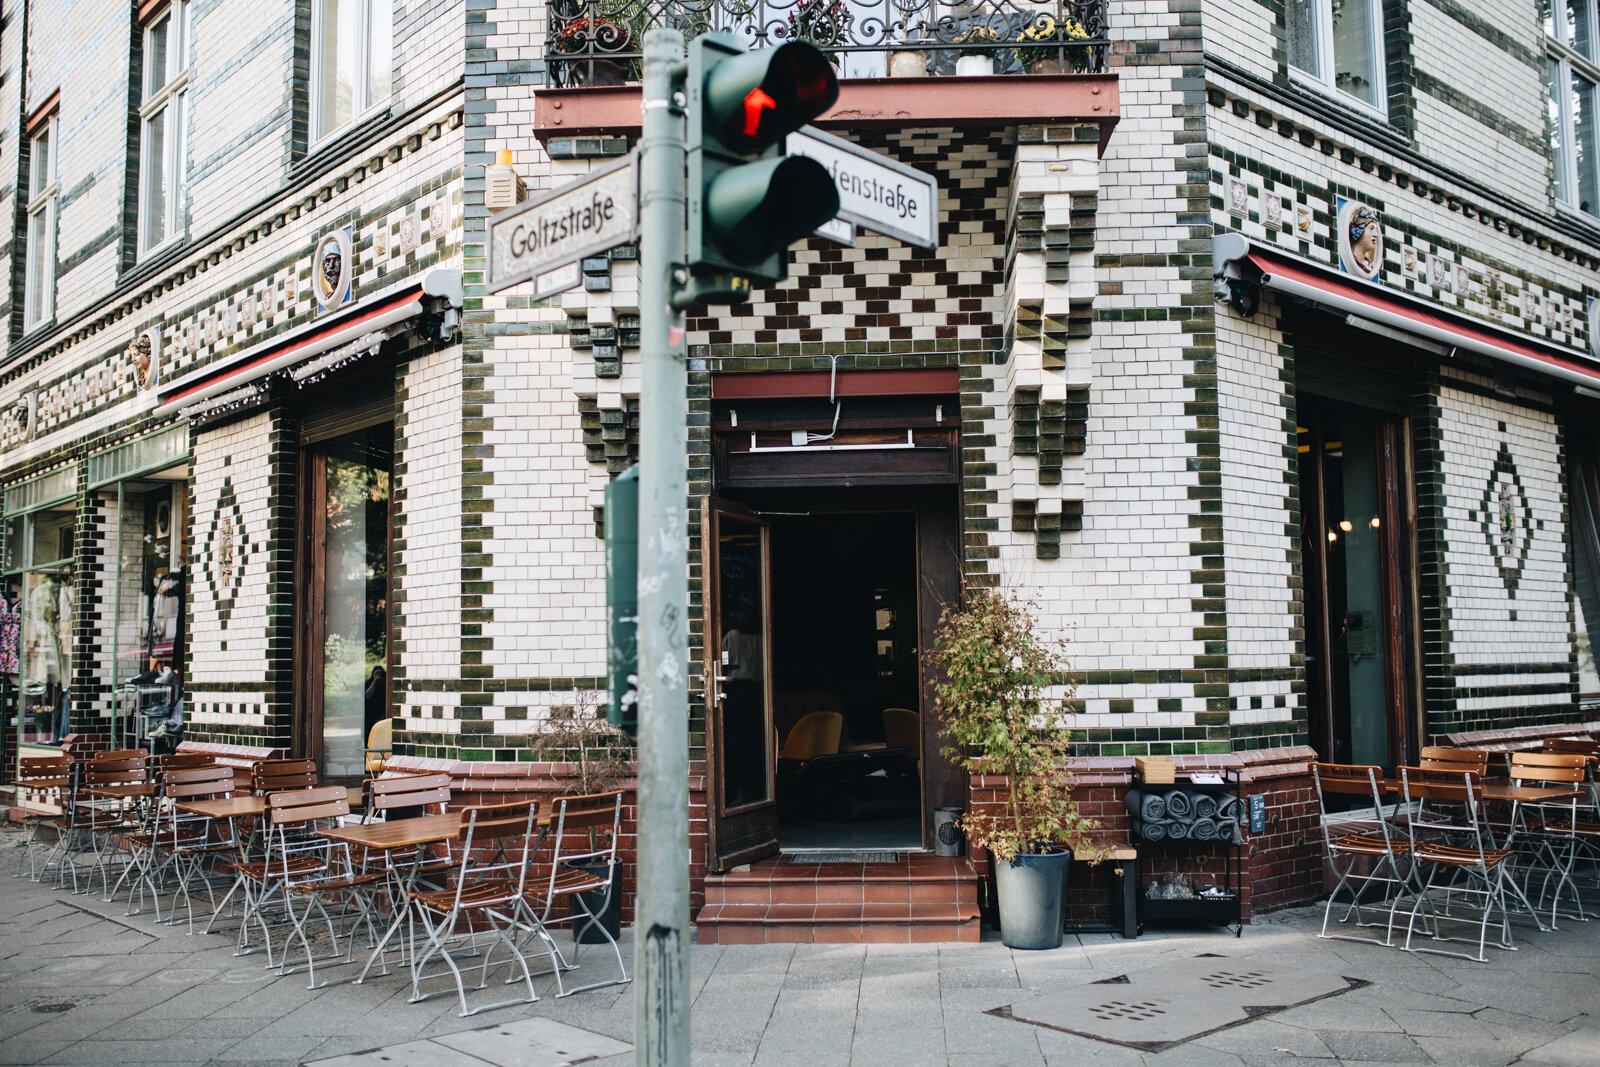 Klinker, Restaurant, Akazienkiez, Bonvivant